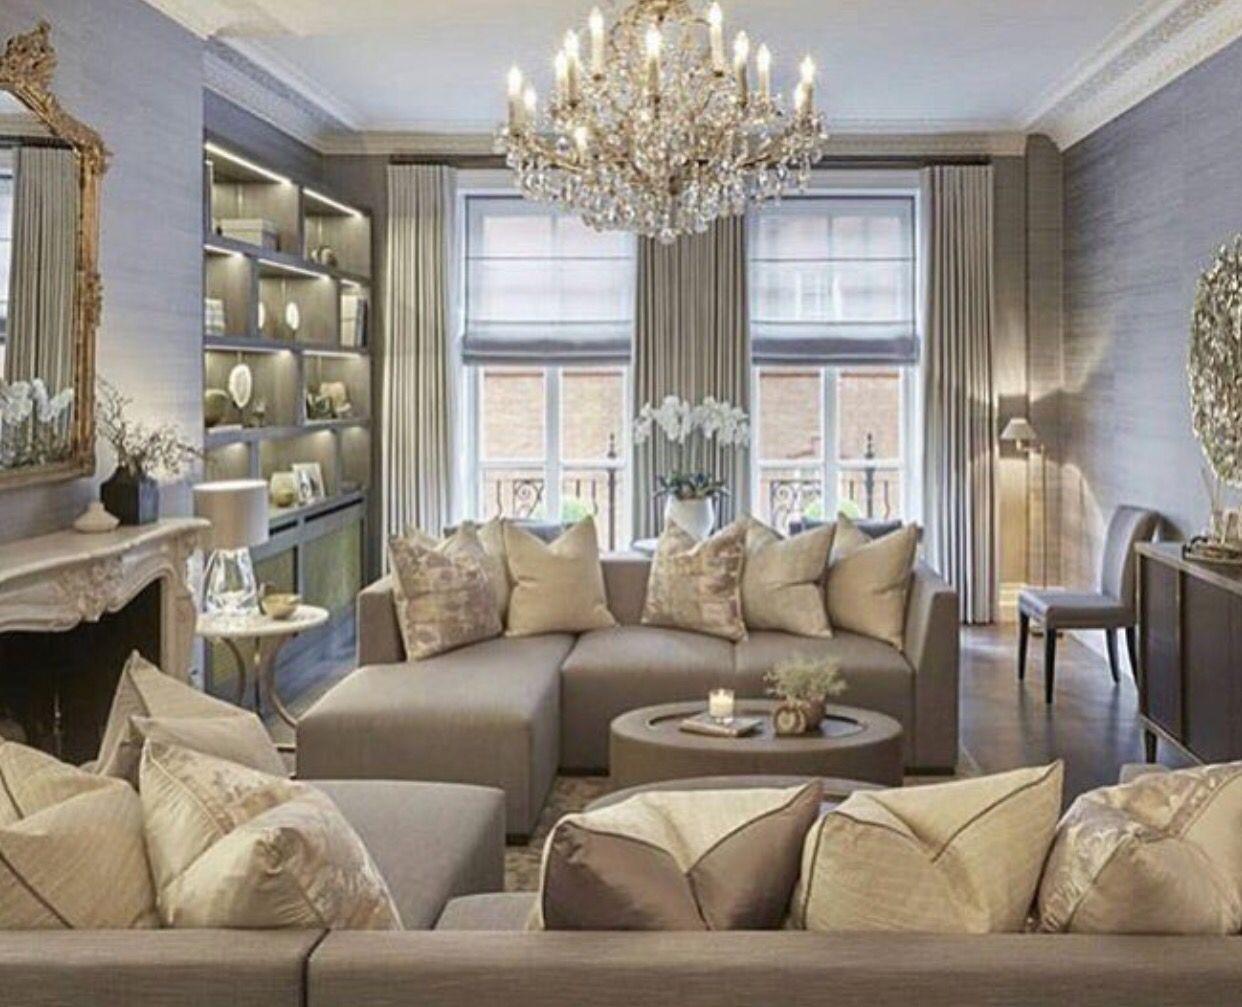 Maison Valentina is a luxury brand specialized